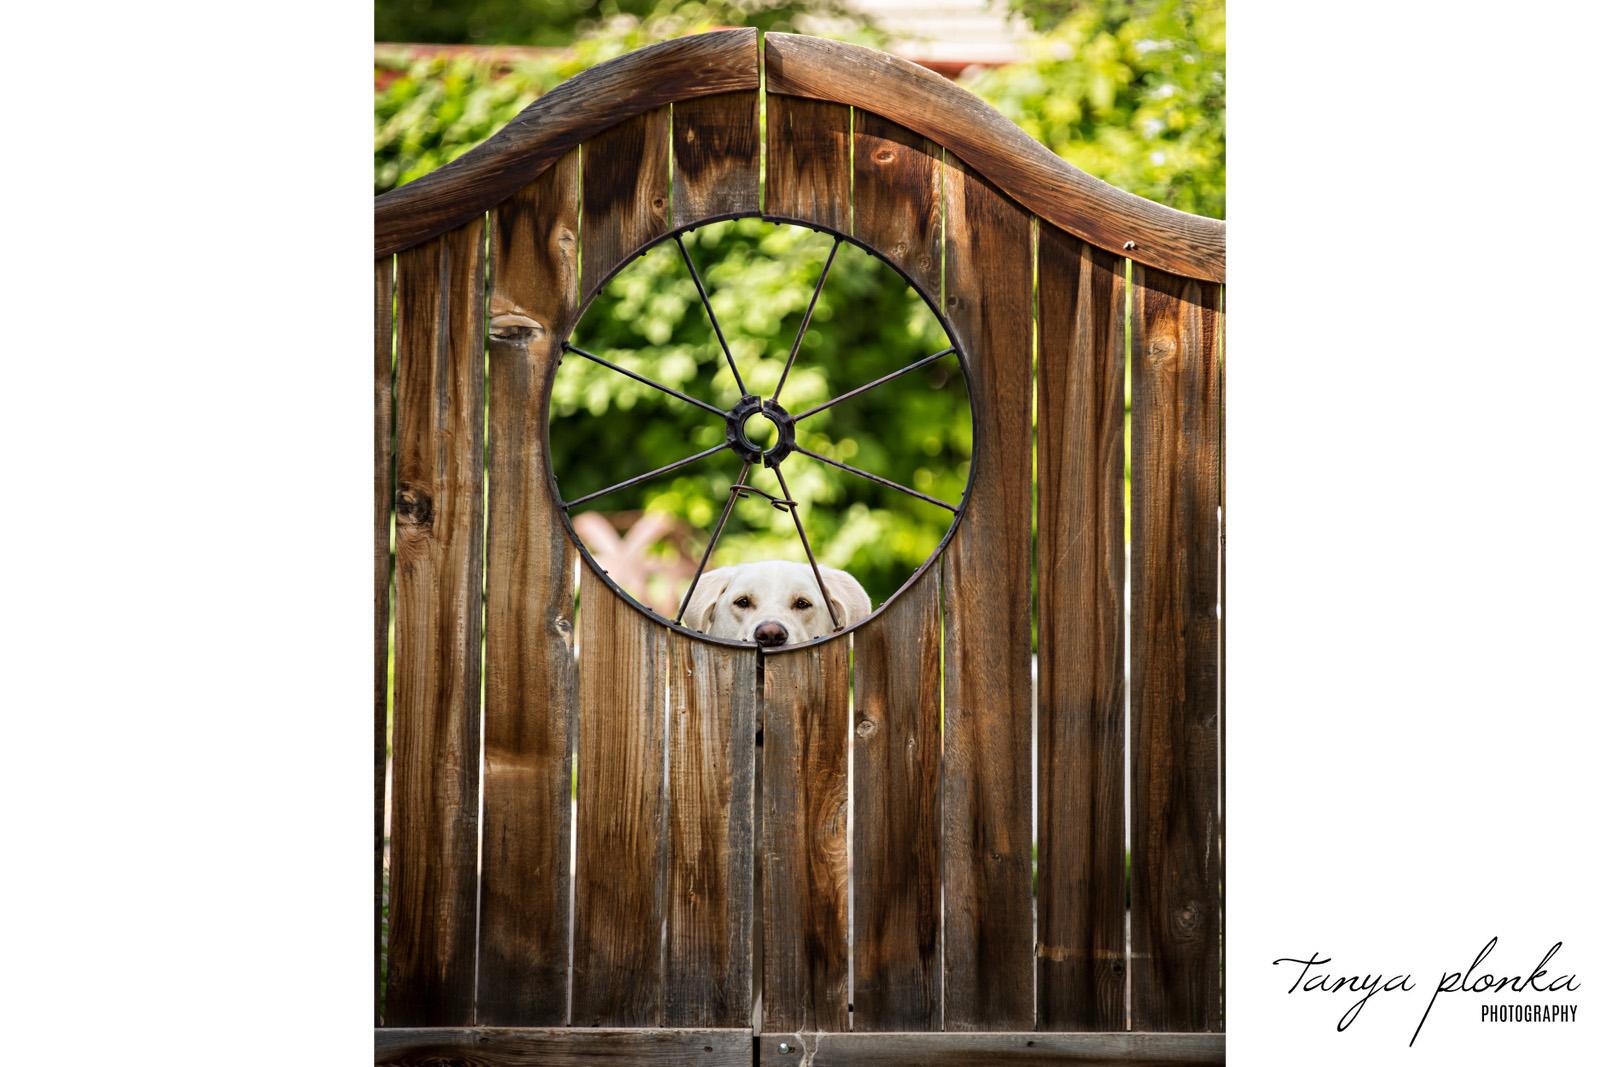 Cute dog looking through circular opening in wooden gate